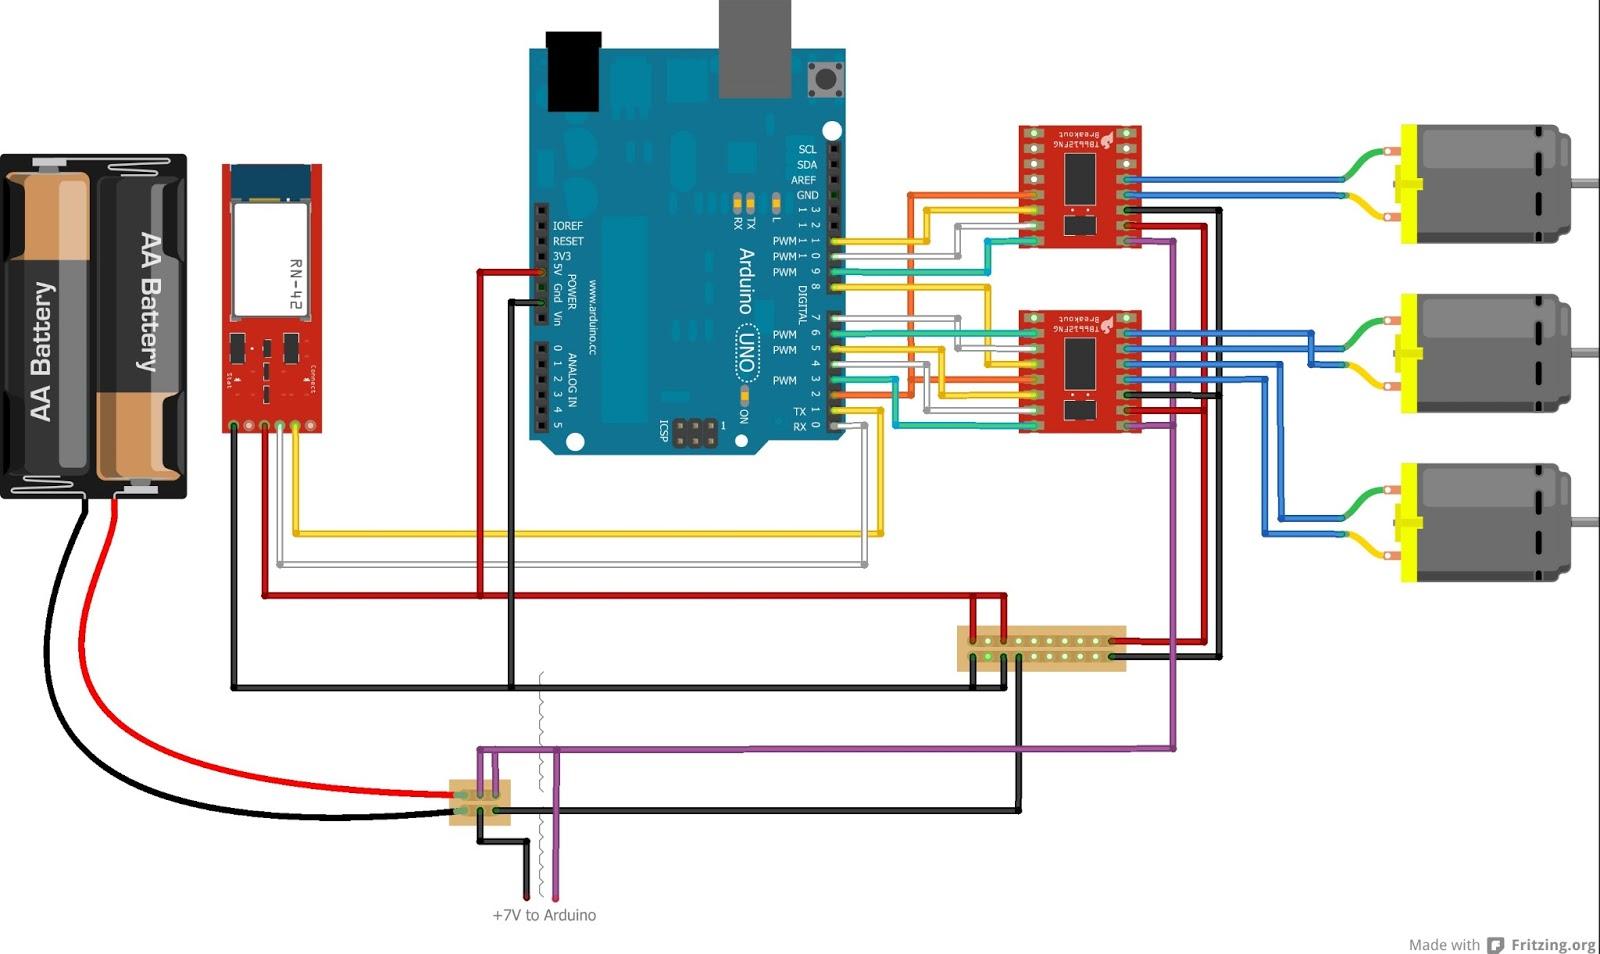 complete+platform20_bb  M Real Wiring Diagram on 5.3 engine diagram, 5.3 fuel system diagram, 5.3 firing order diagram, 5.3 motor diagram, 5.3 coolant diagram,